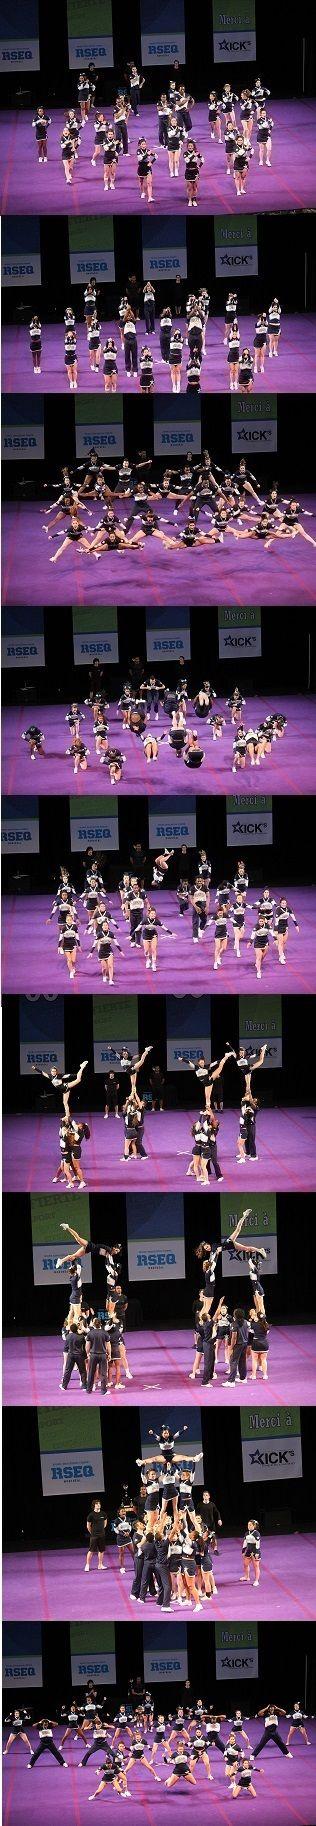 #cheerleading #fiertéuqam #stunt #gymnastique #jump #UQAM Provinciaux 2013. #team #cheer www.facebook.com/cheerleadingUQAM @UQAM | Université du Québec à Montréal